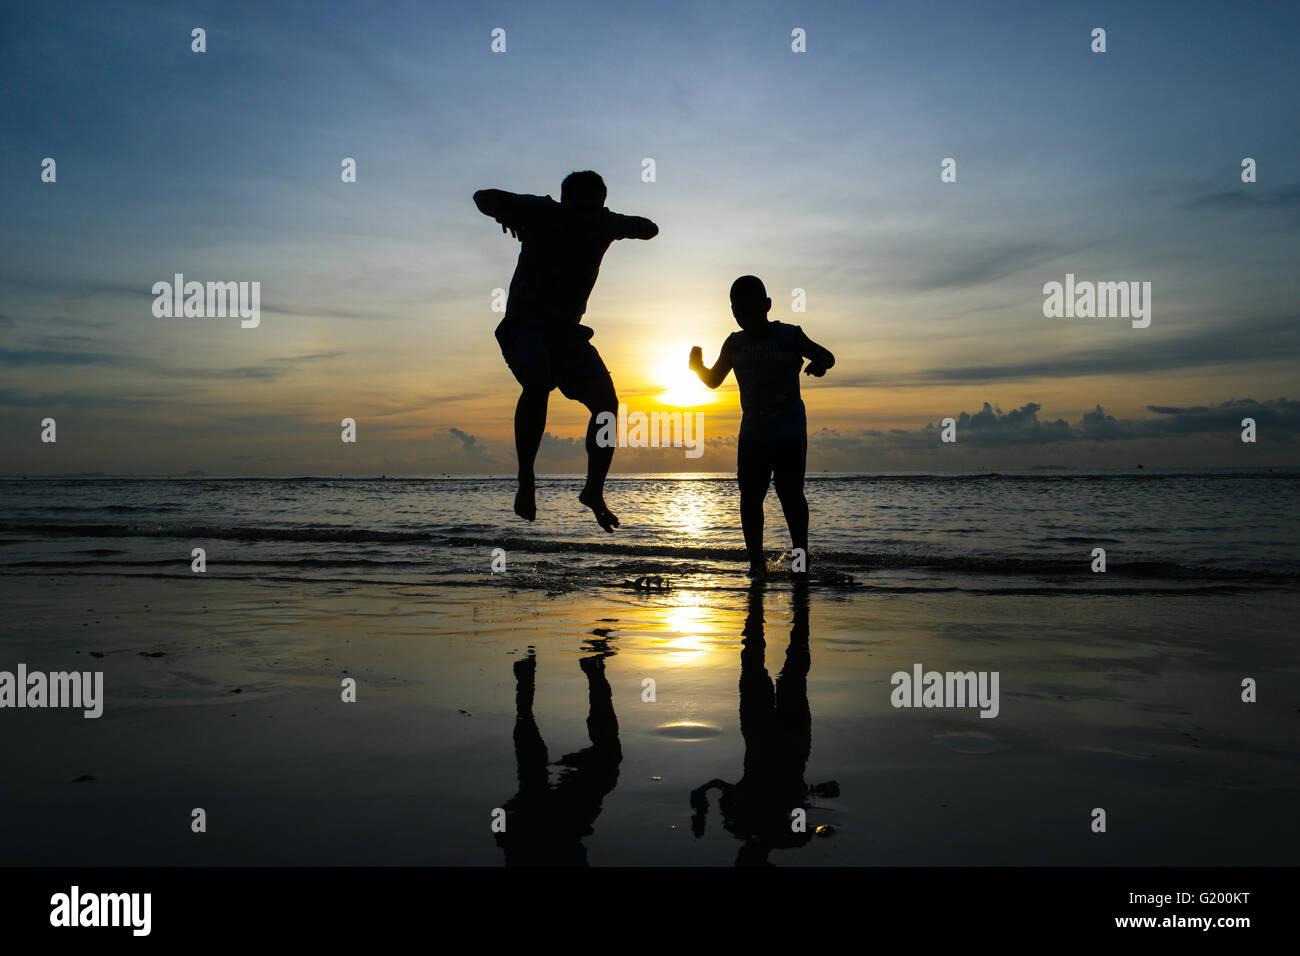 boys jumping on the beach Sunset Stock Photo